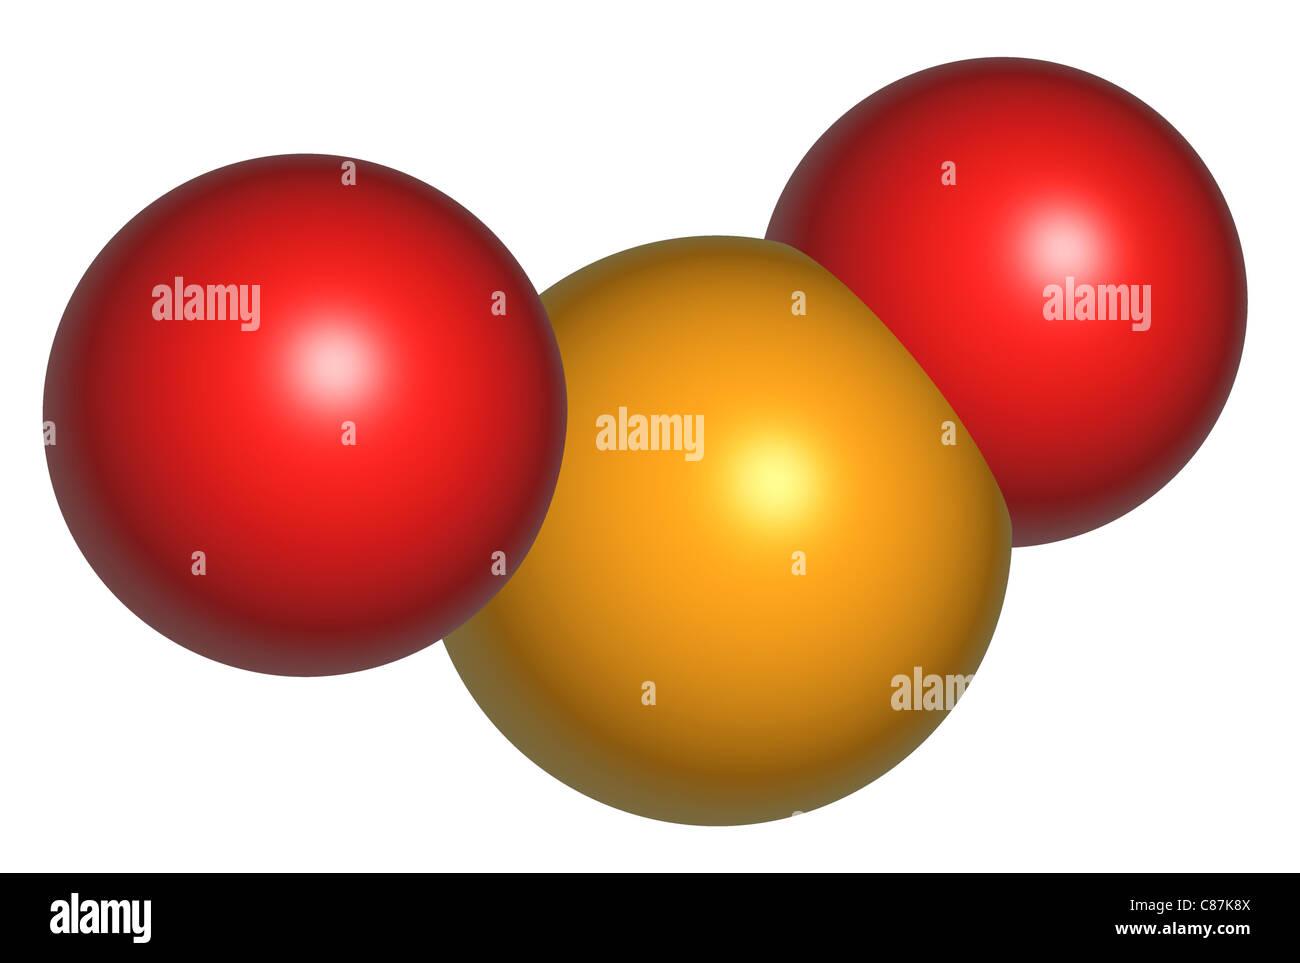 Molecule of Sulphur Dioxide - Stock Image